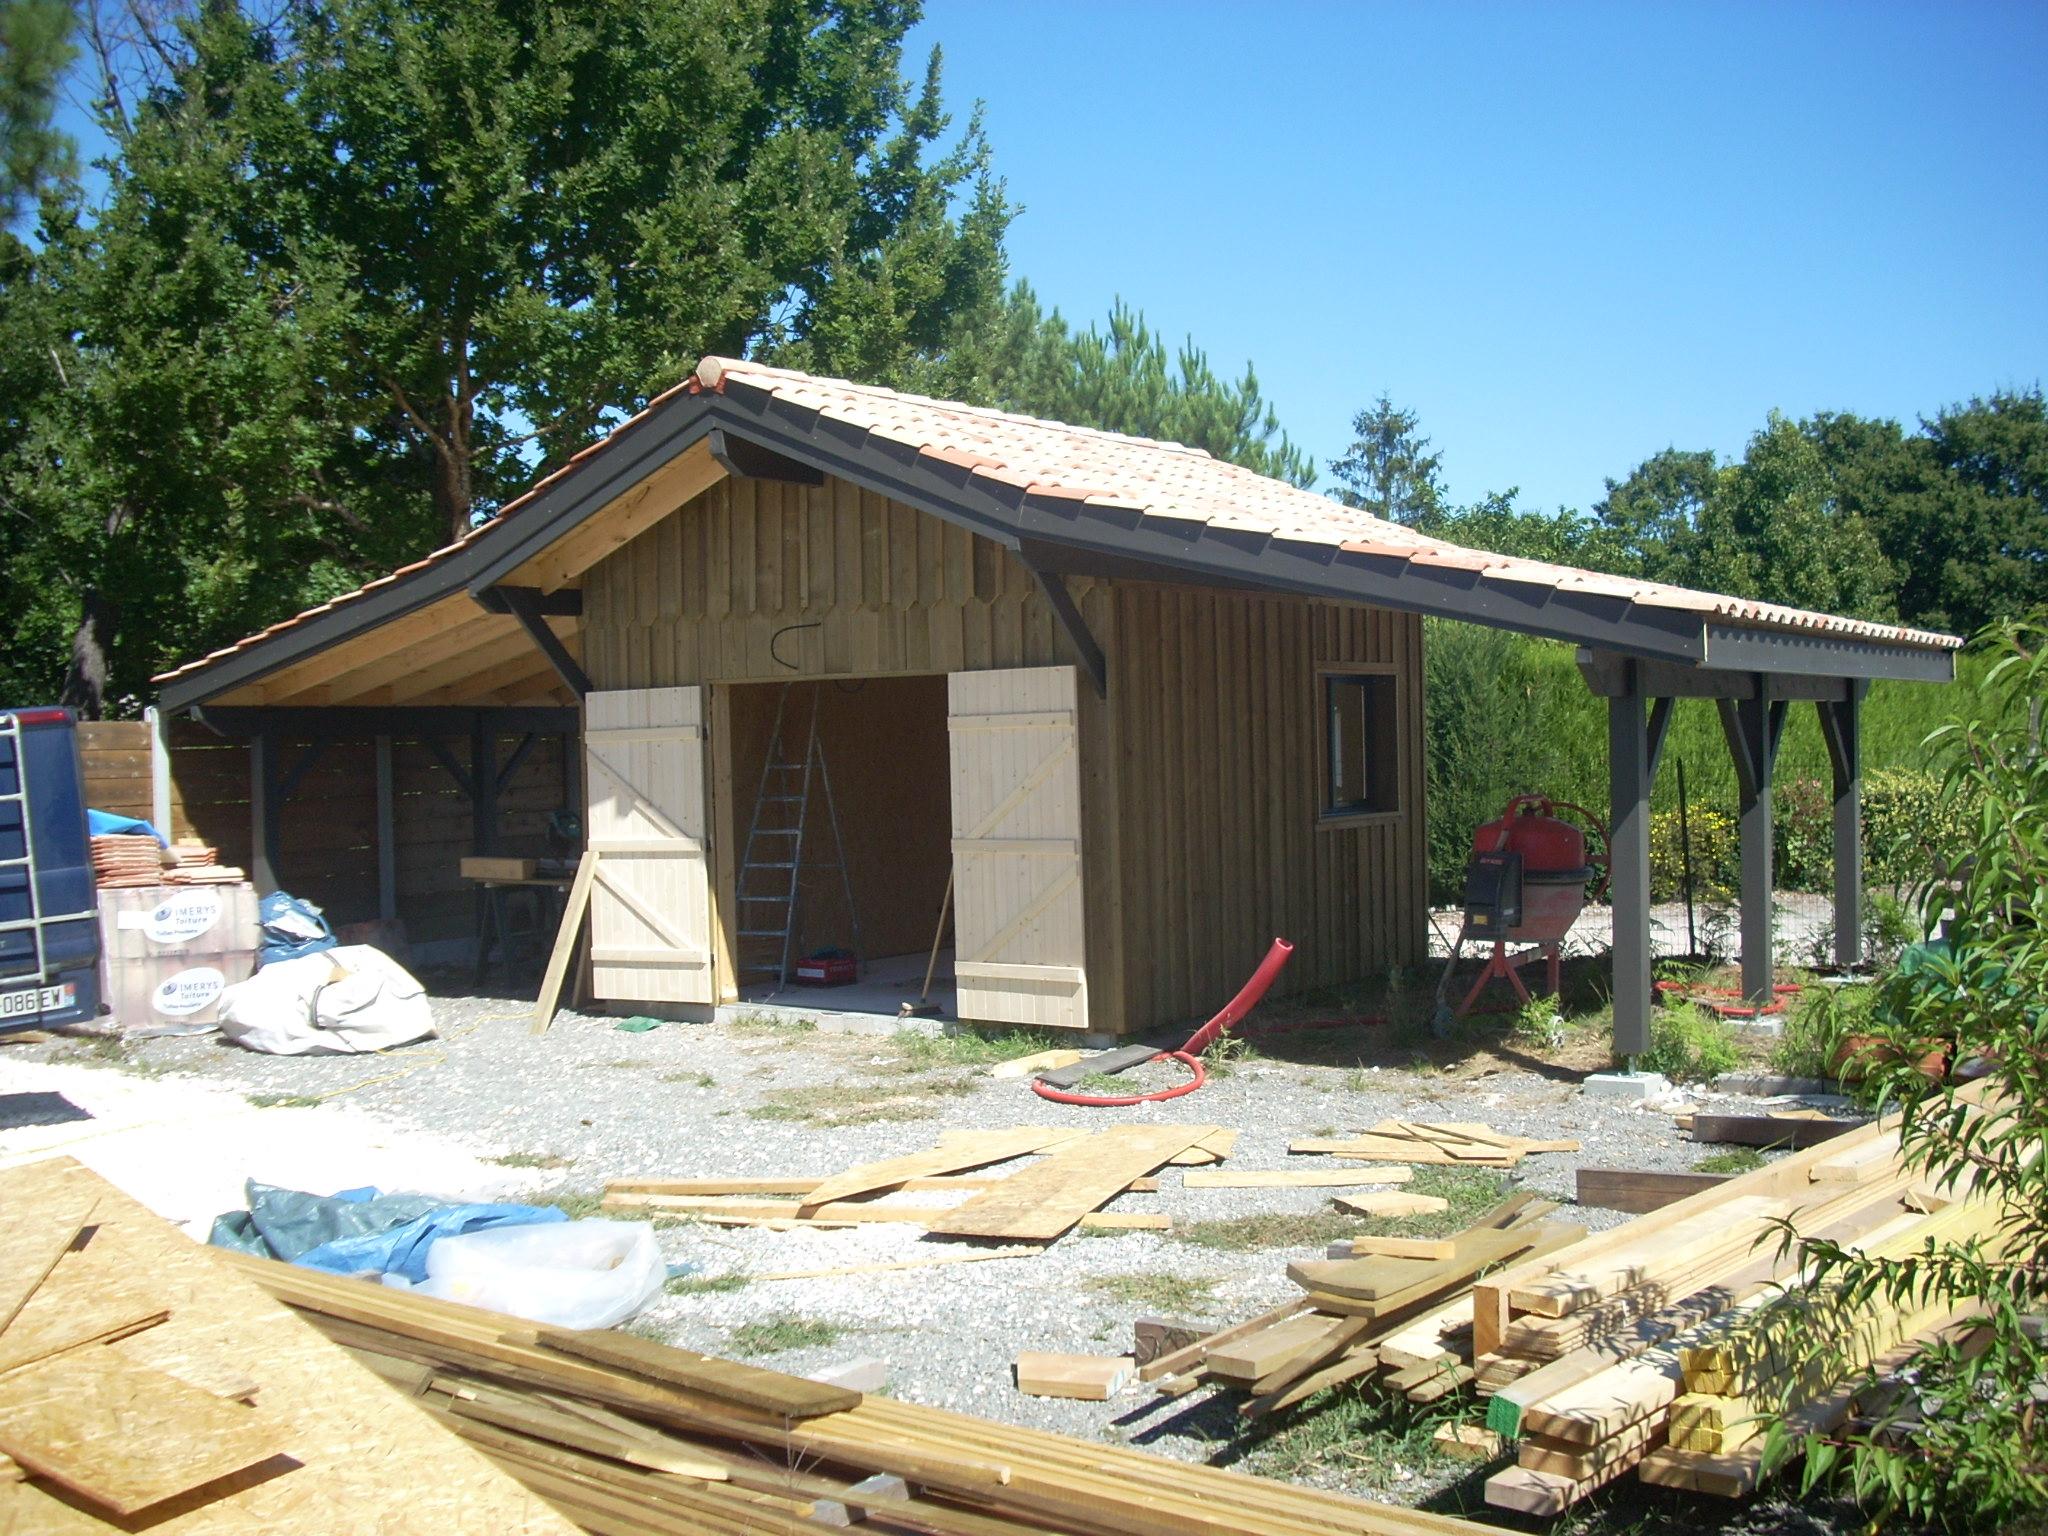 Abri de jardin sur mesure en ossature bois artisan for Abri de jardin sur mesure